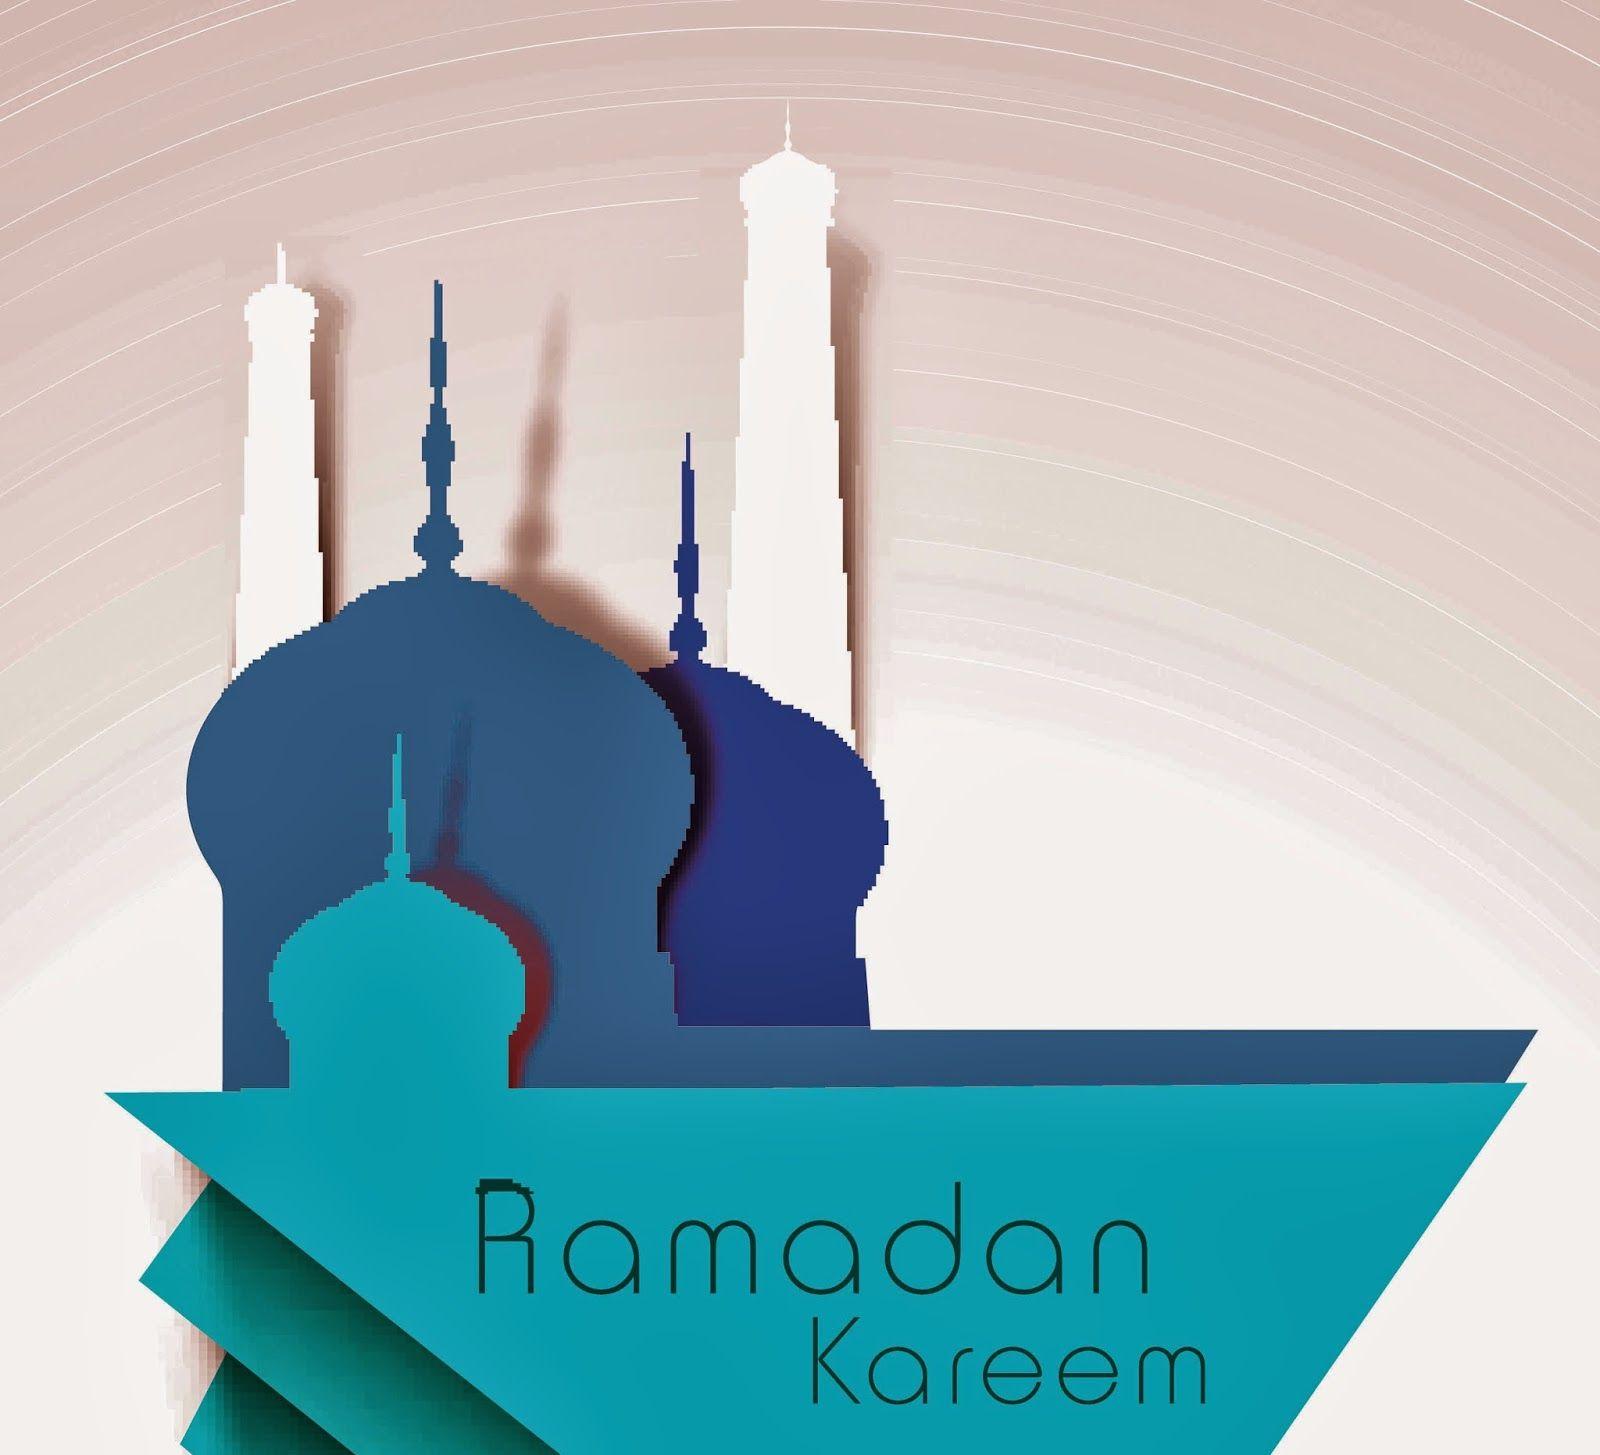 wedding invitation decoration clip art%0A free clip arts  Ramadan kareem vector clipart Arabic Islamic calligraphy